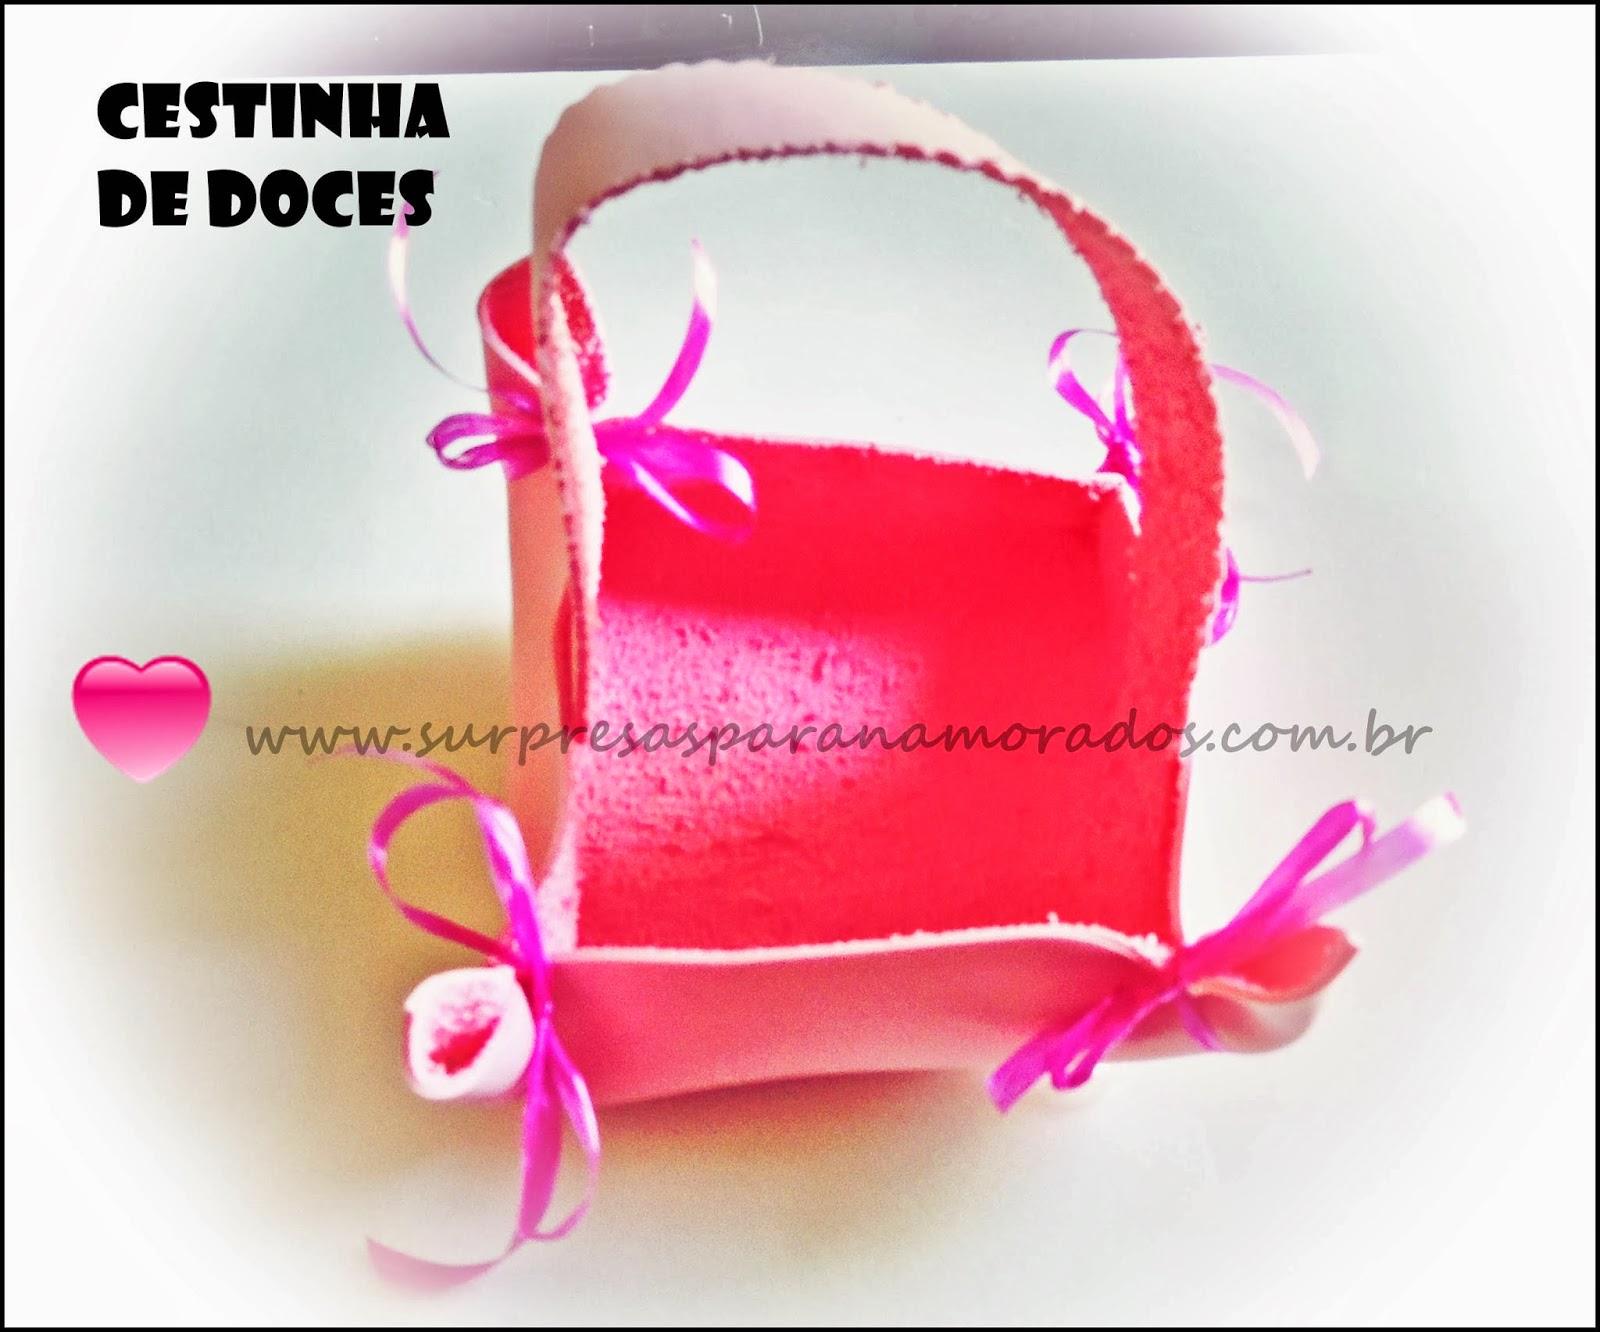 cesta de doces presente dia dos namorados